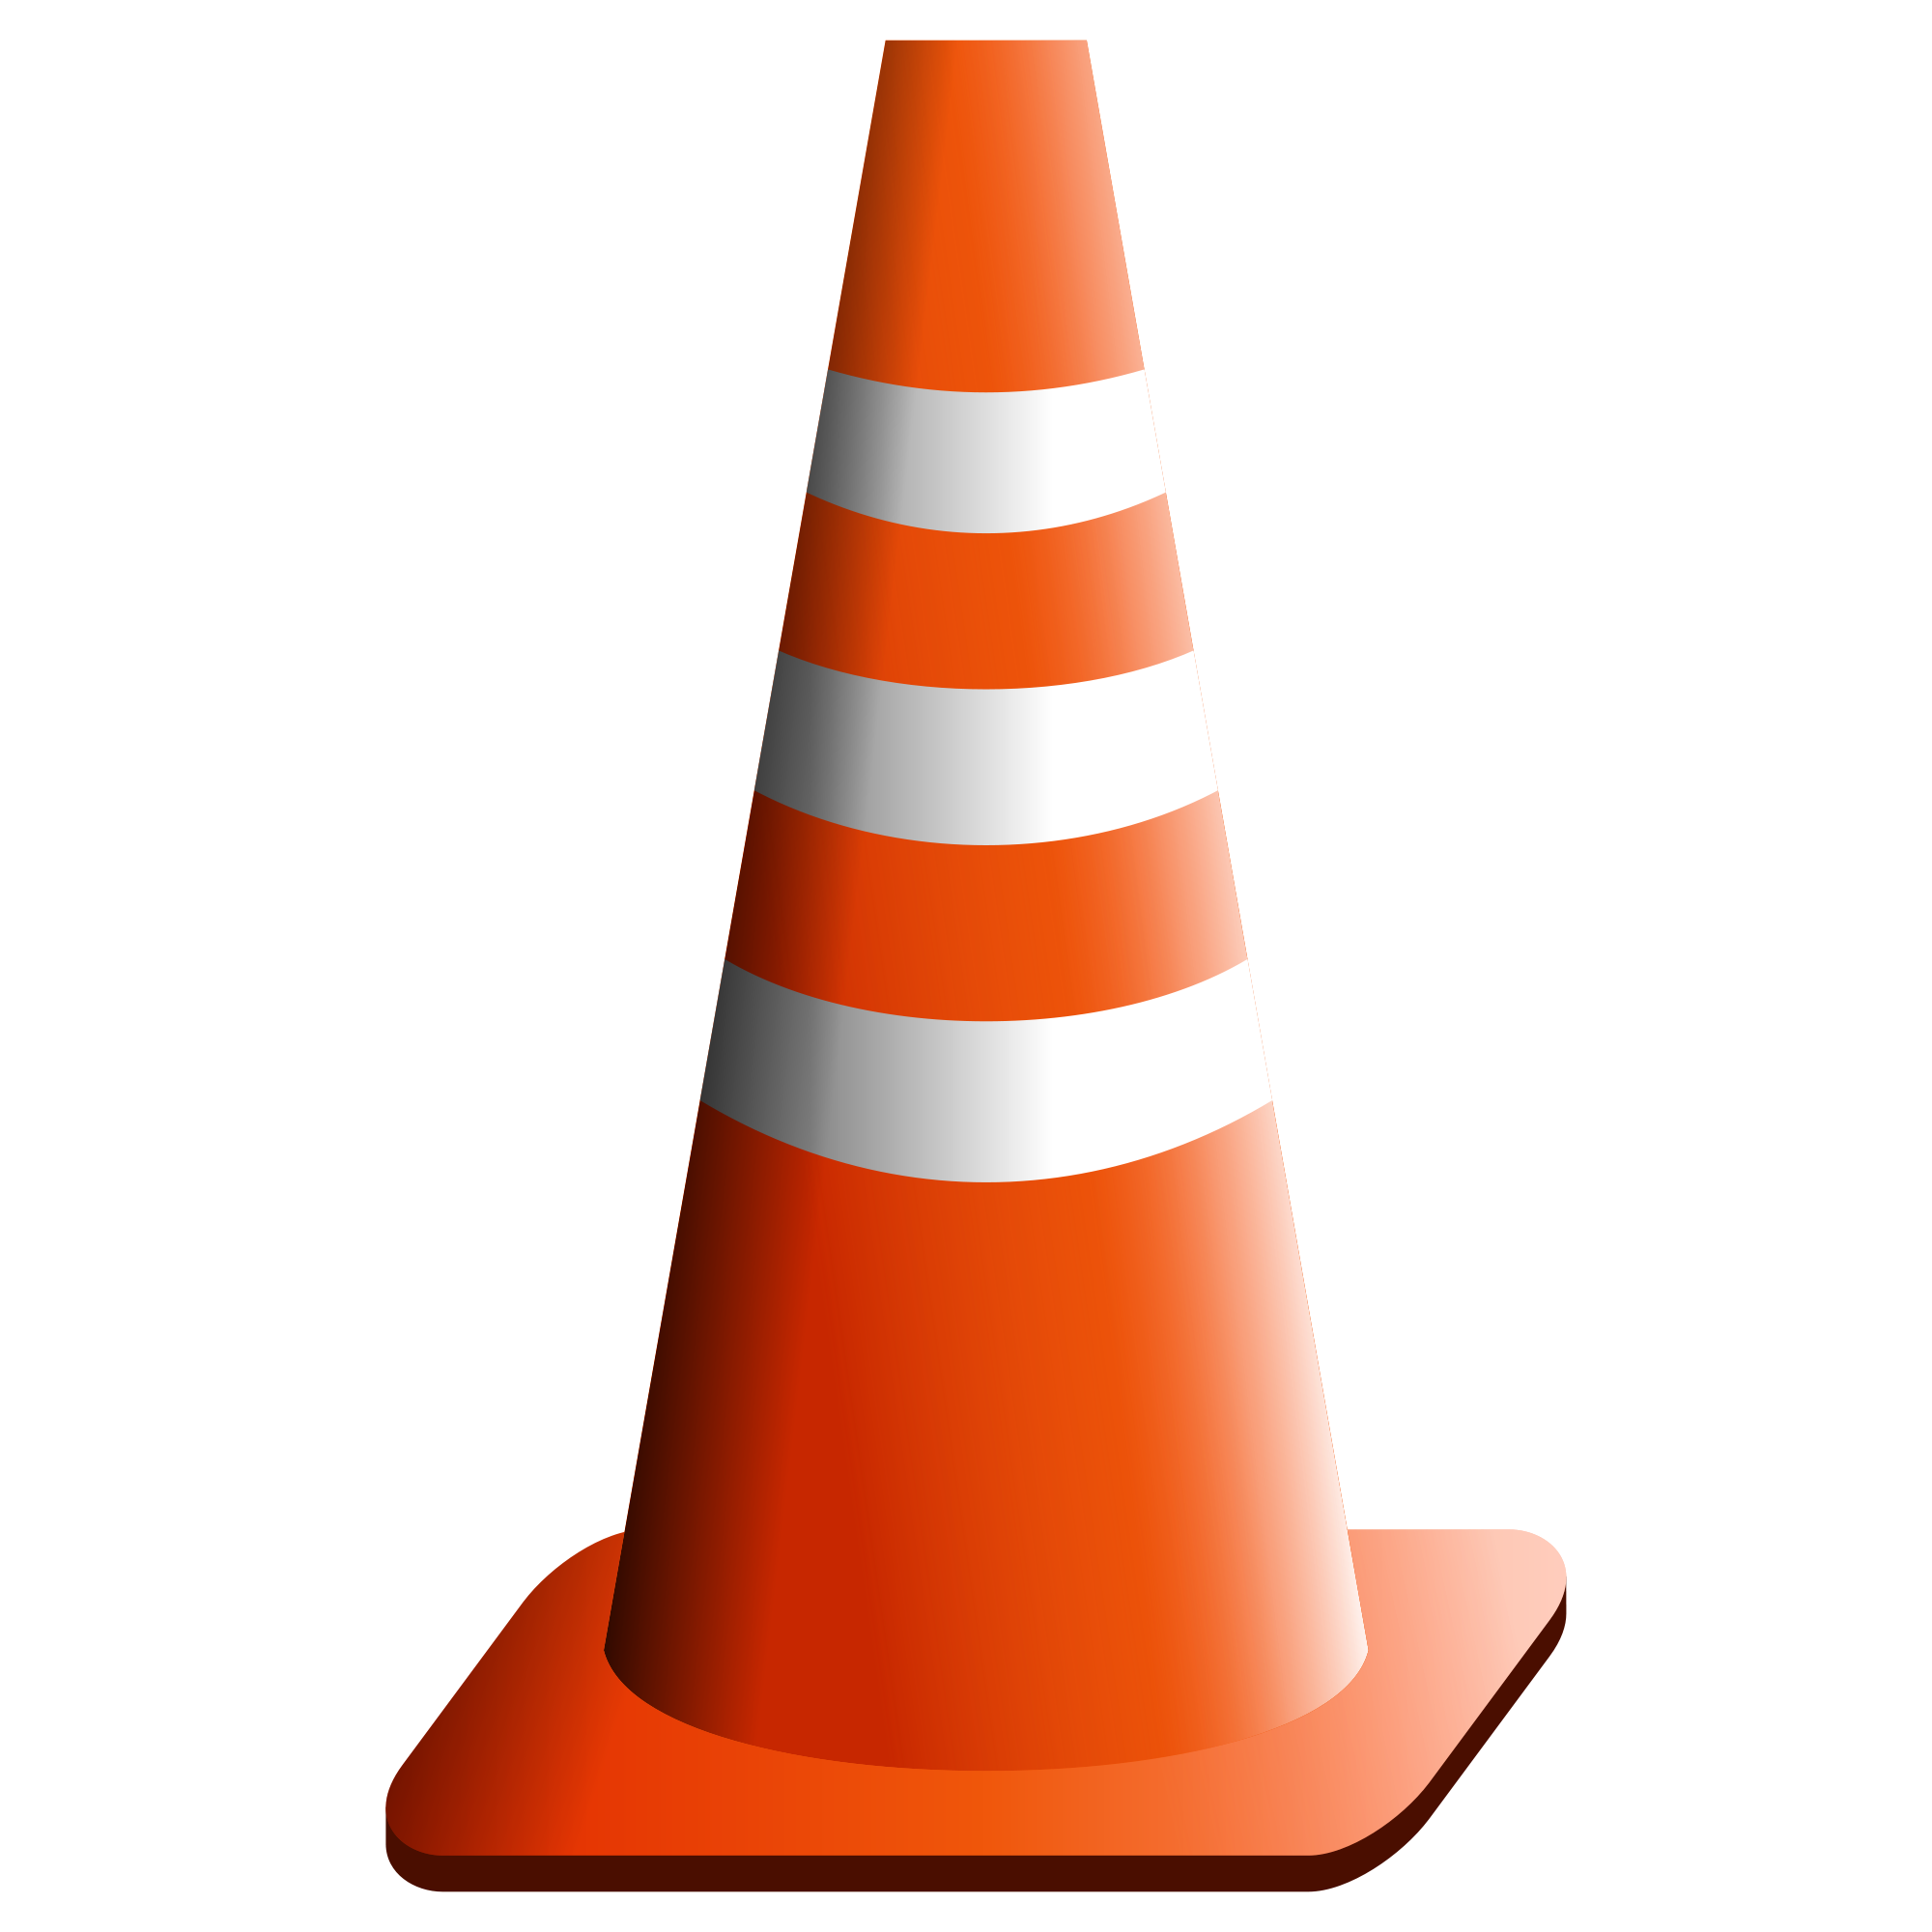 File construction svg wikimedia. Cone clipart safety cone